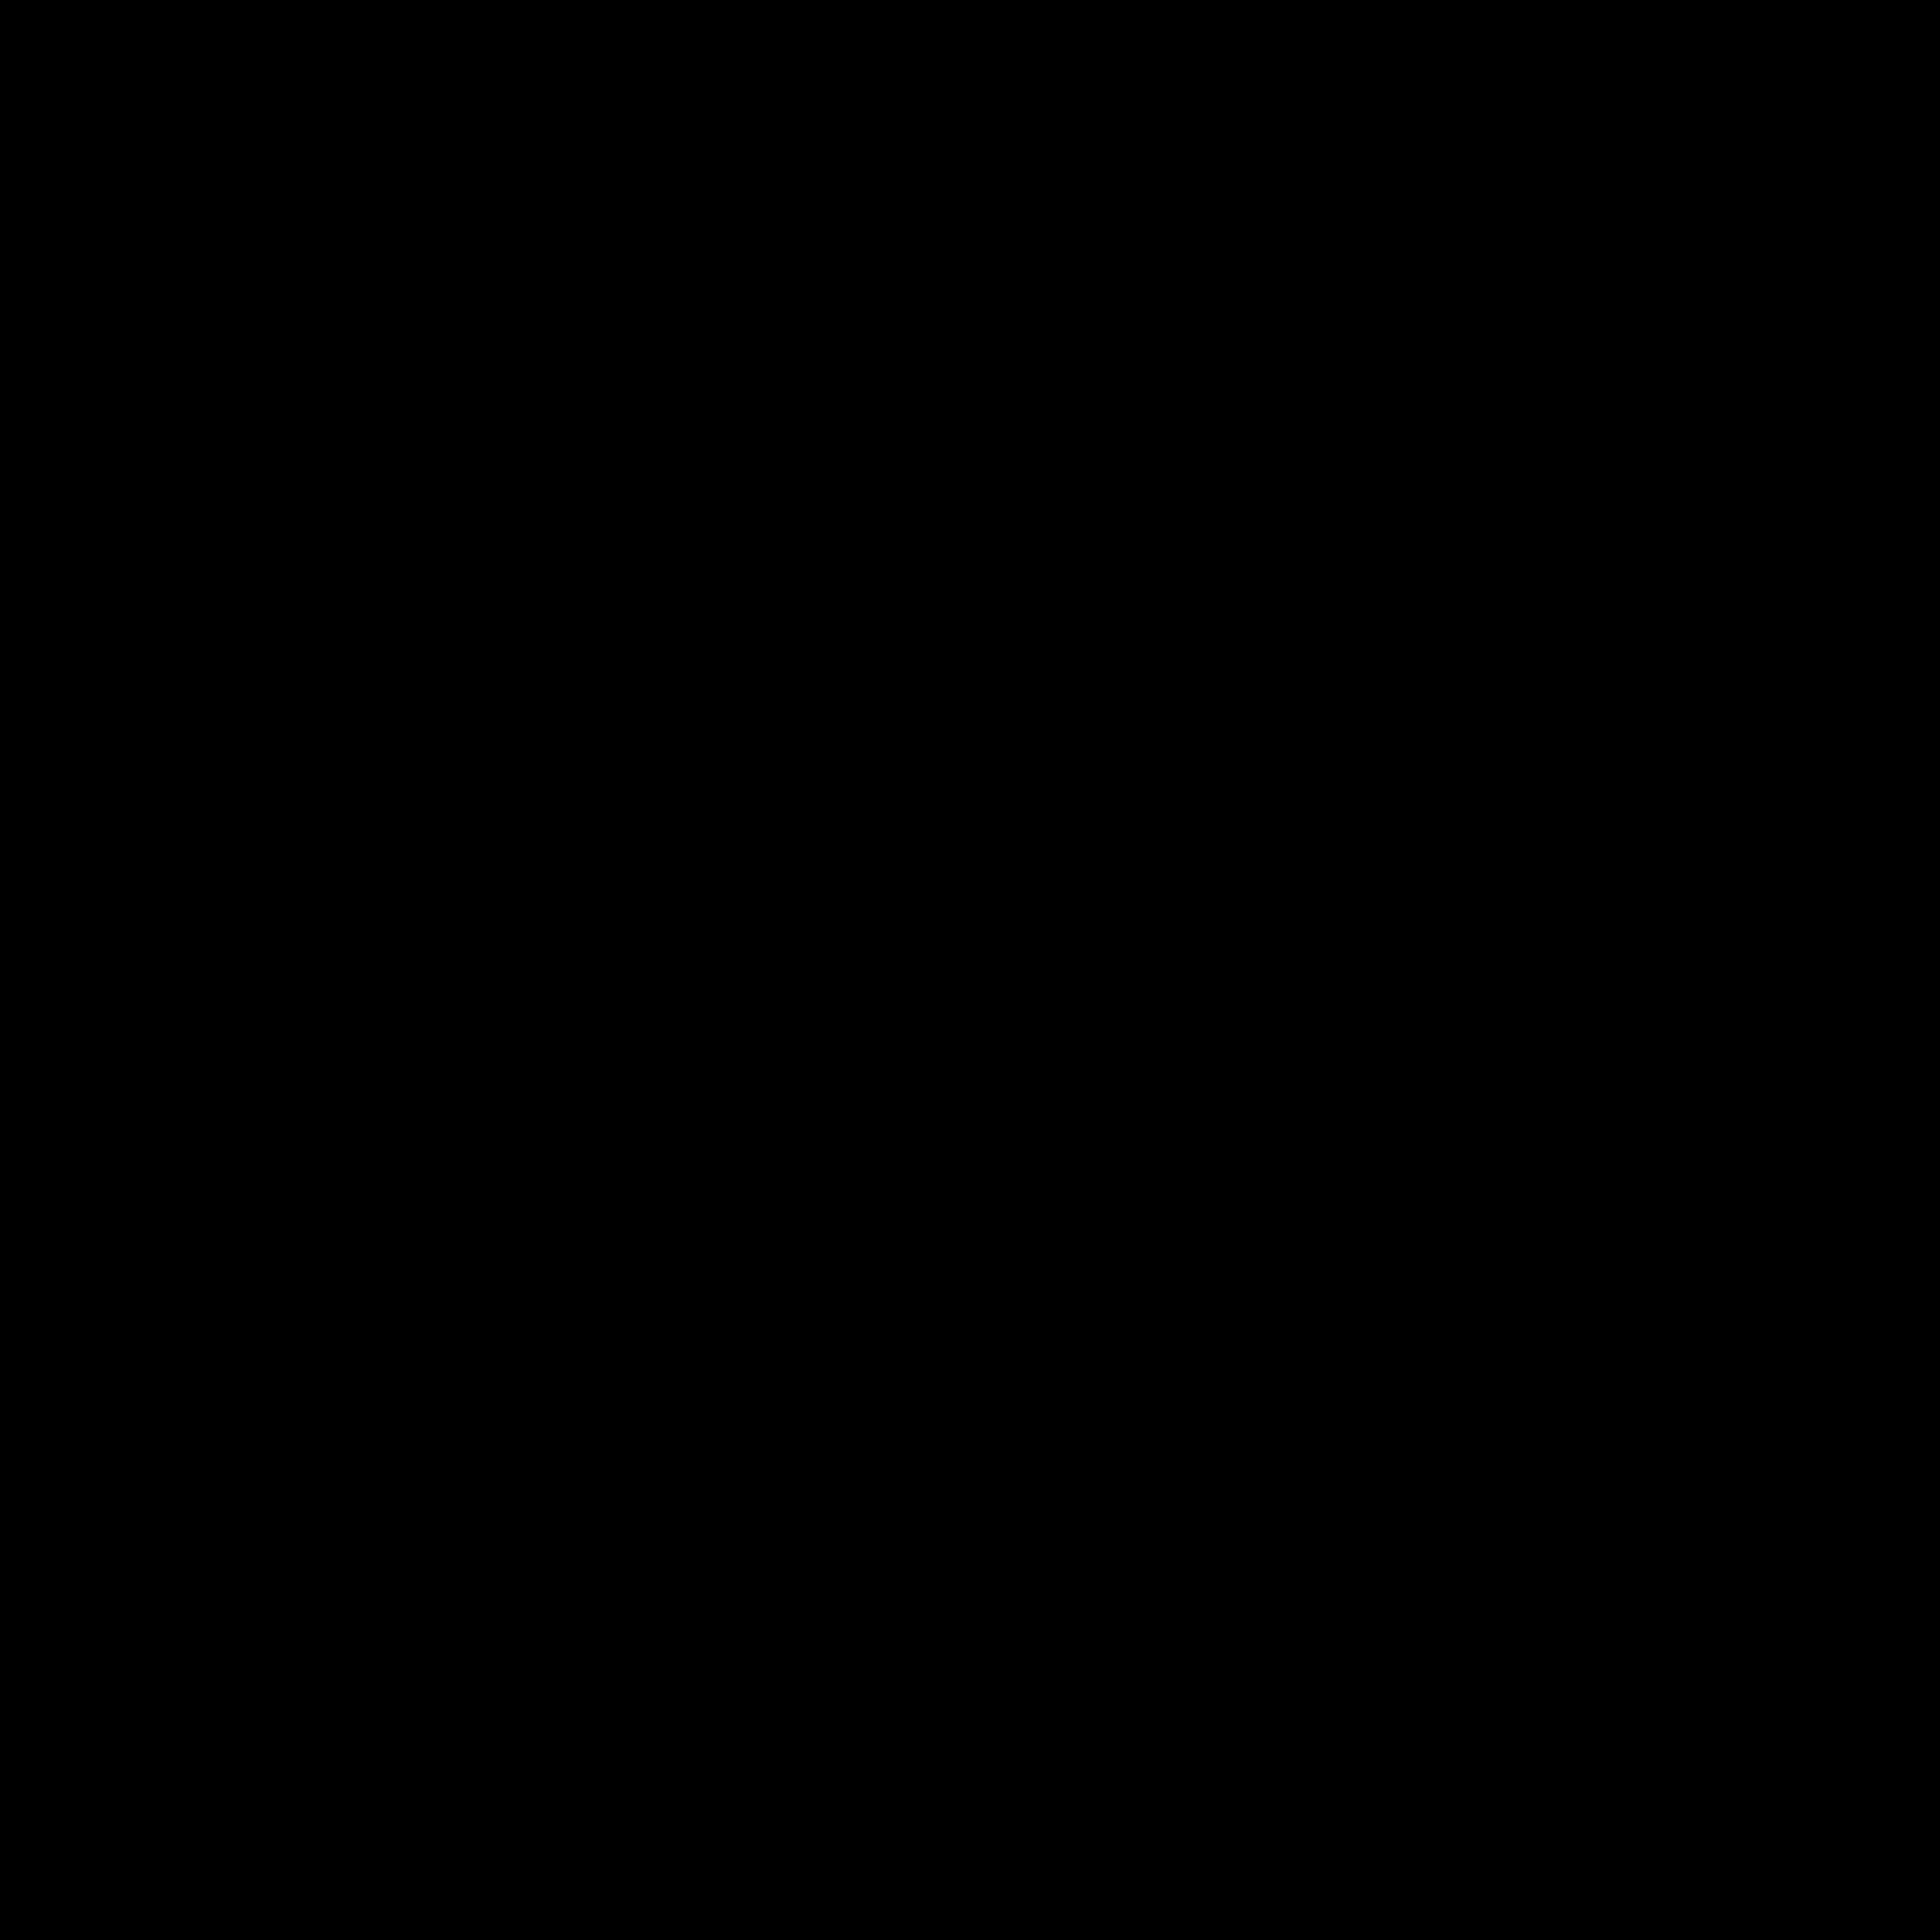 godaddy logo 0 - Godaddy Logo